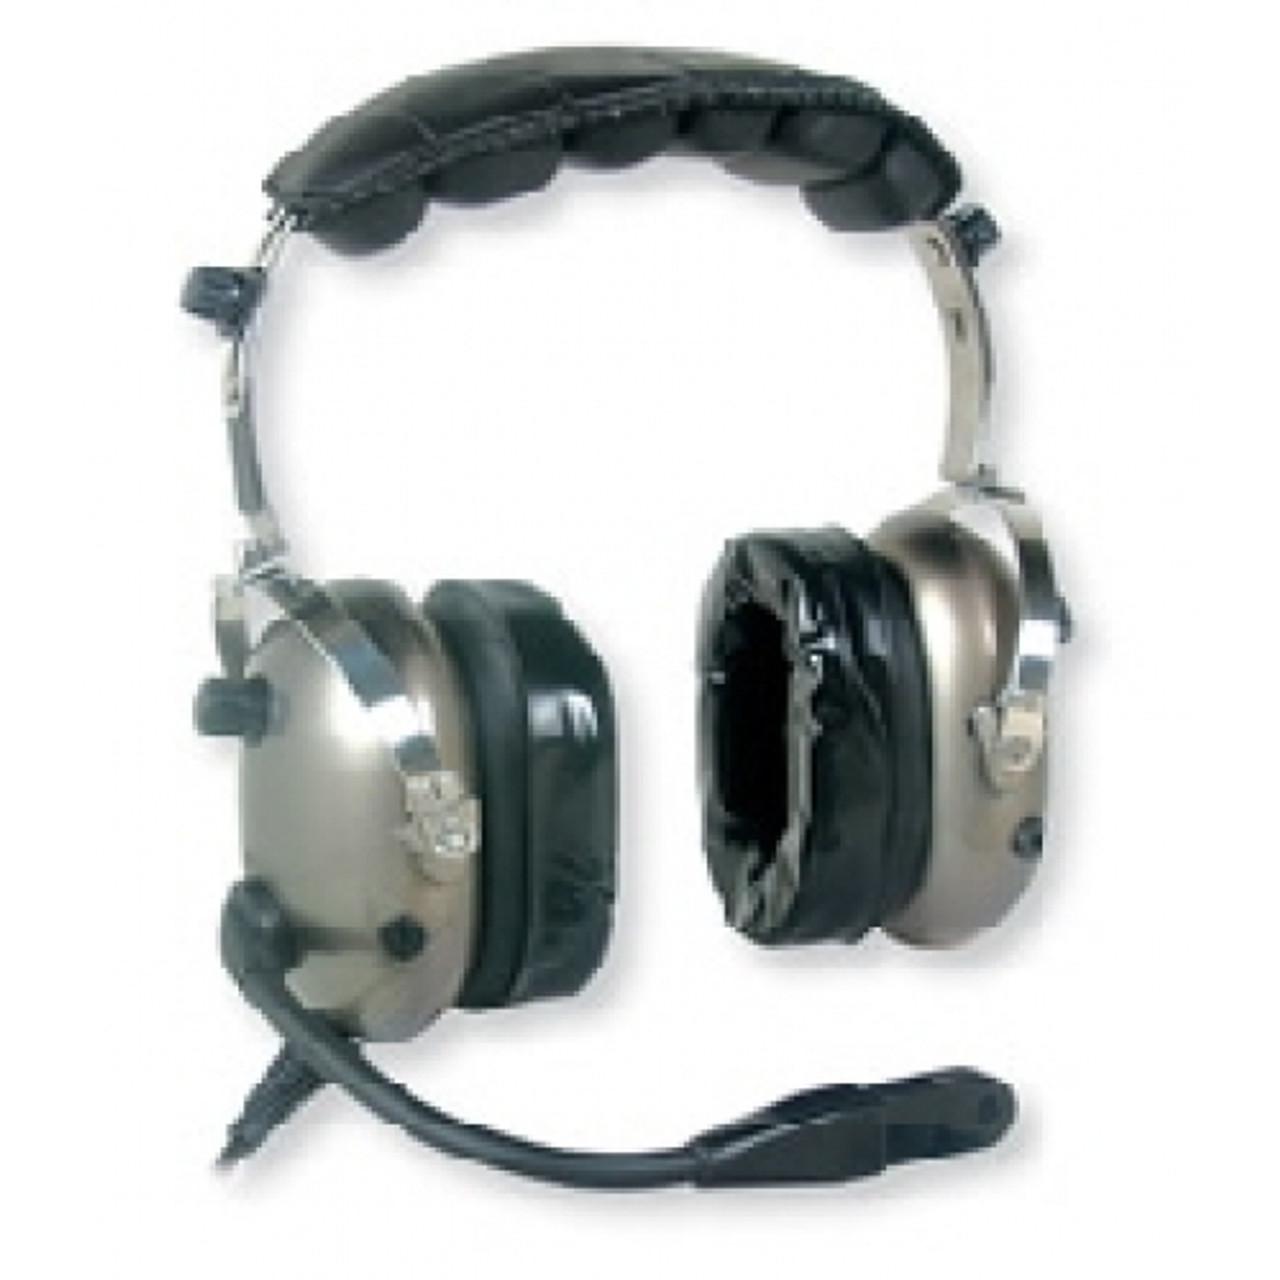 AVCOMM AC-950 ANR Headset